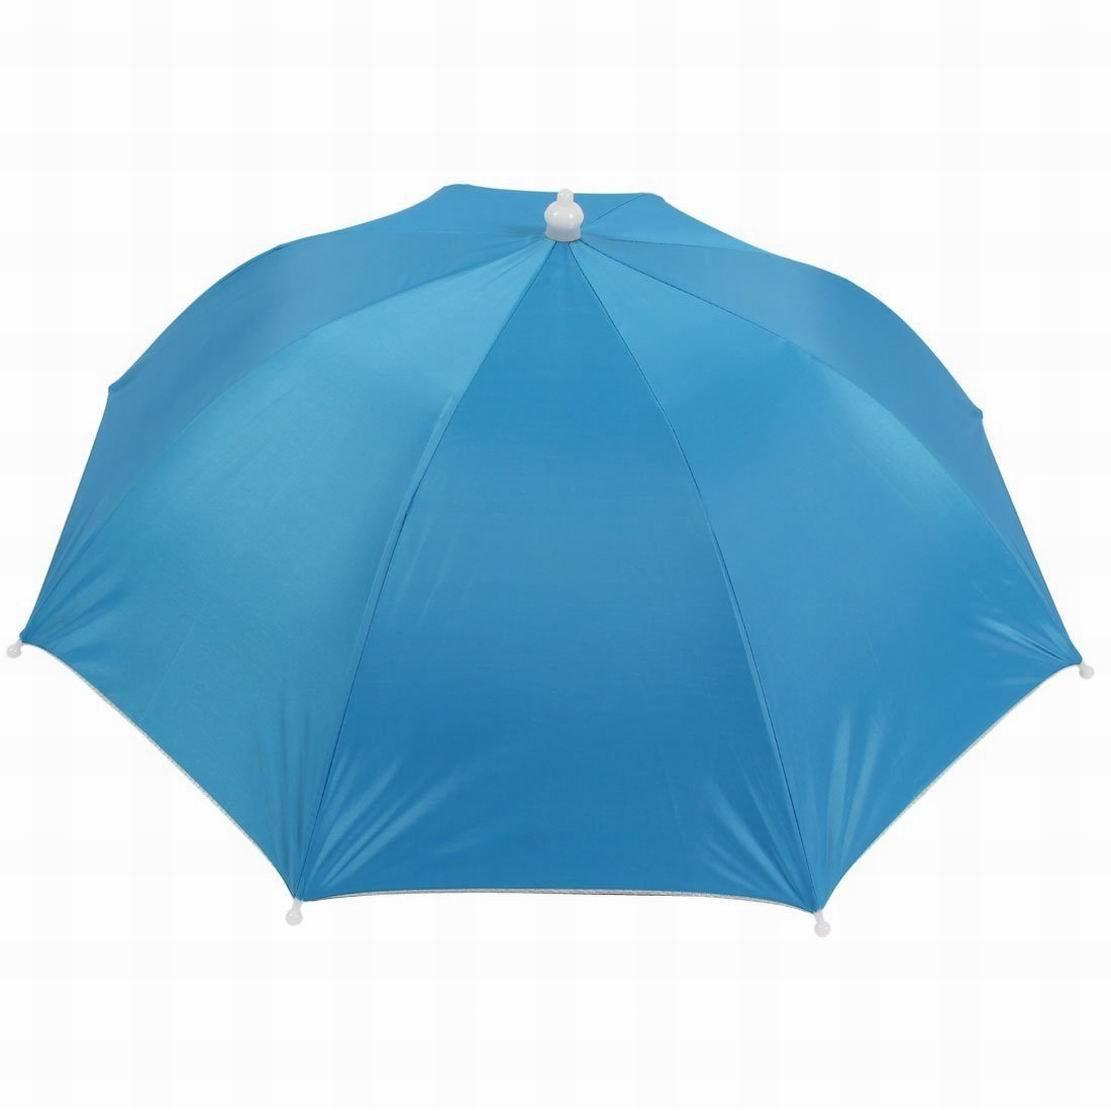 B074JSZCBKugtellブルー伸縮性ヘッドバンドハンズフリー傘帽子Headwearの釣り B074JSZCBK, 岡山市:d8fe09f5 --- itxassou.fr